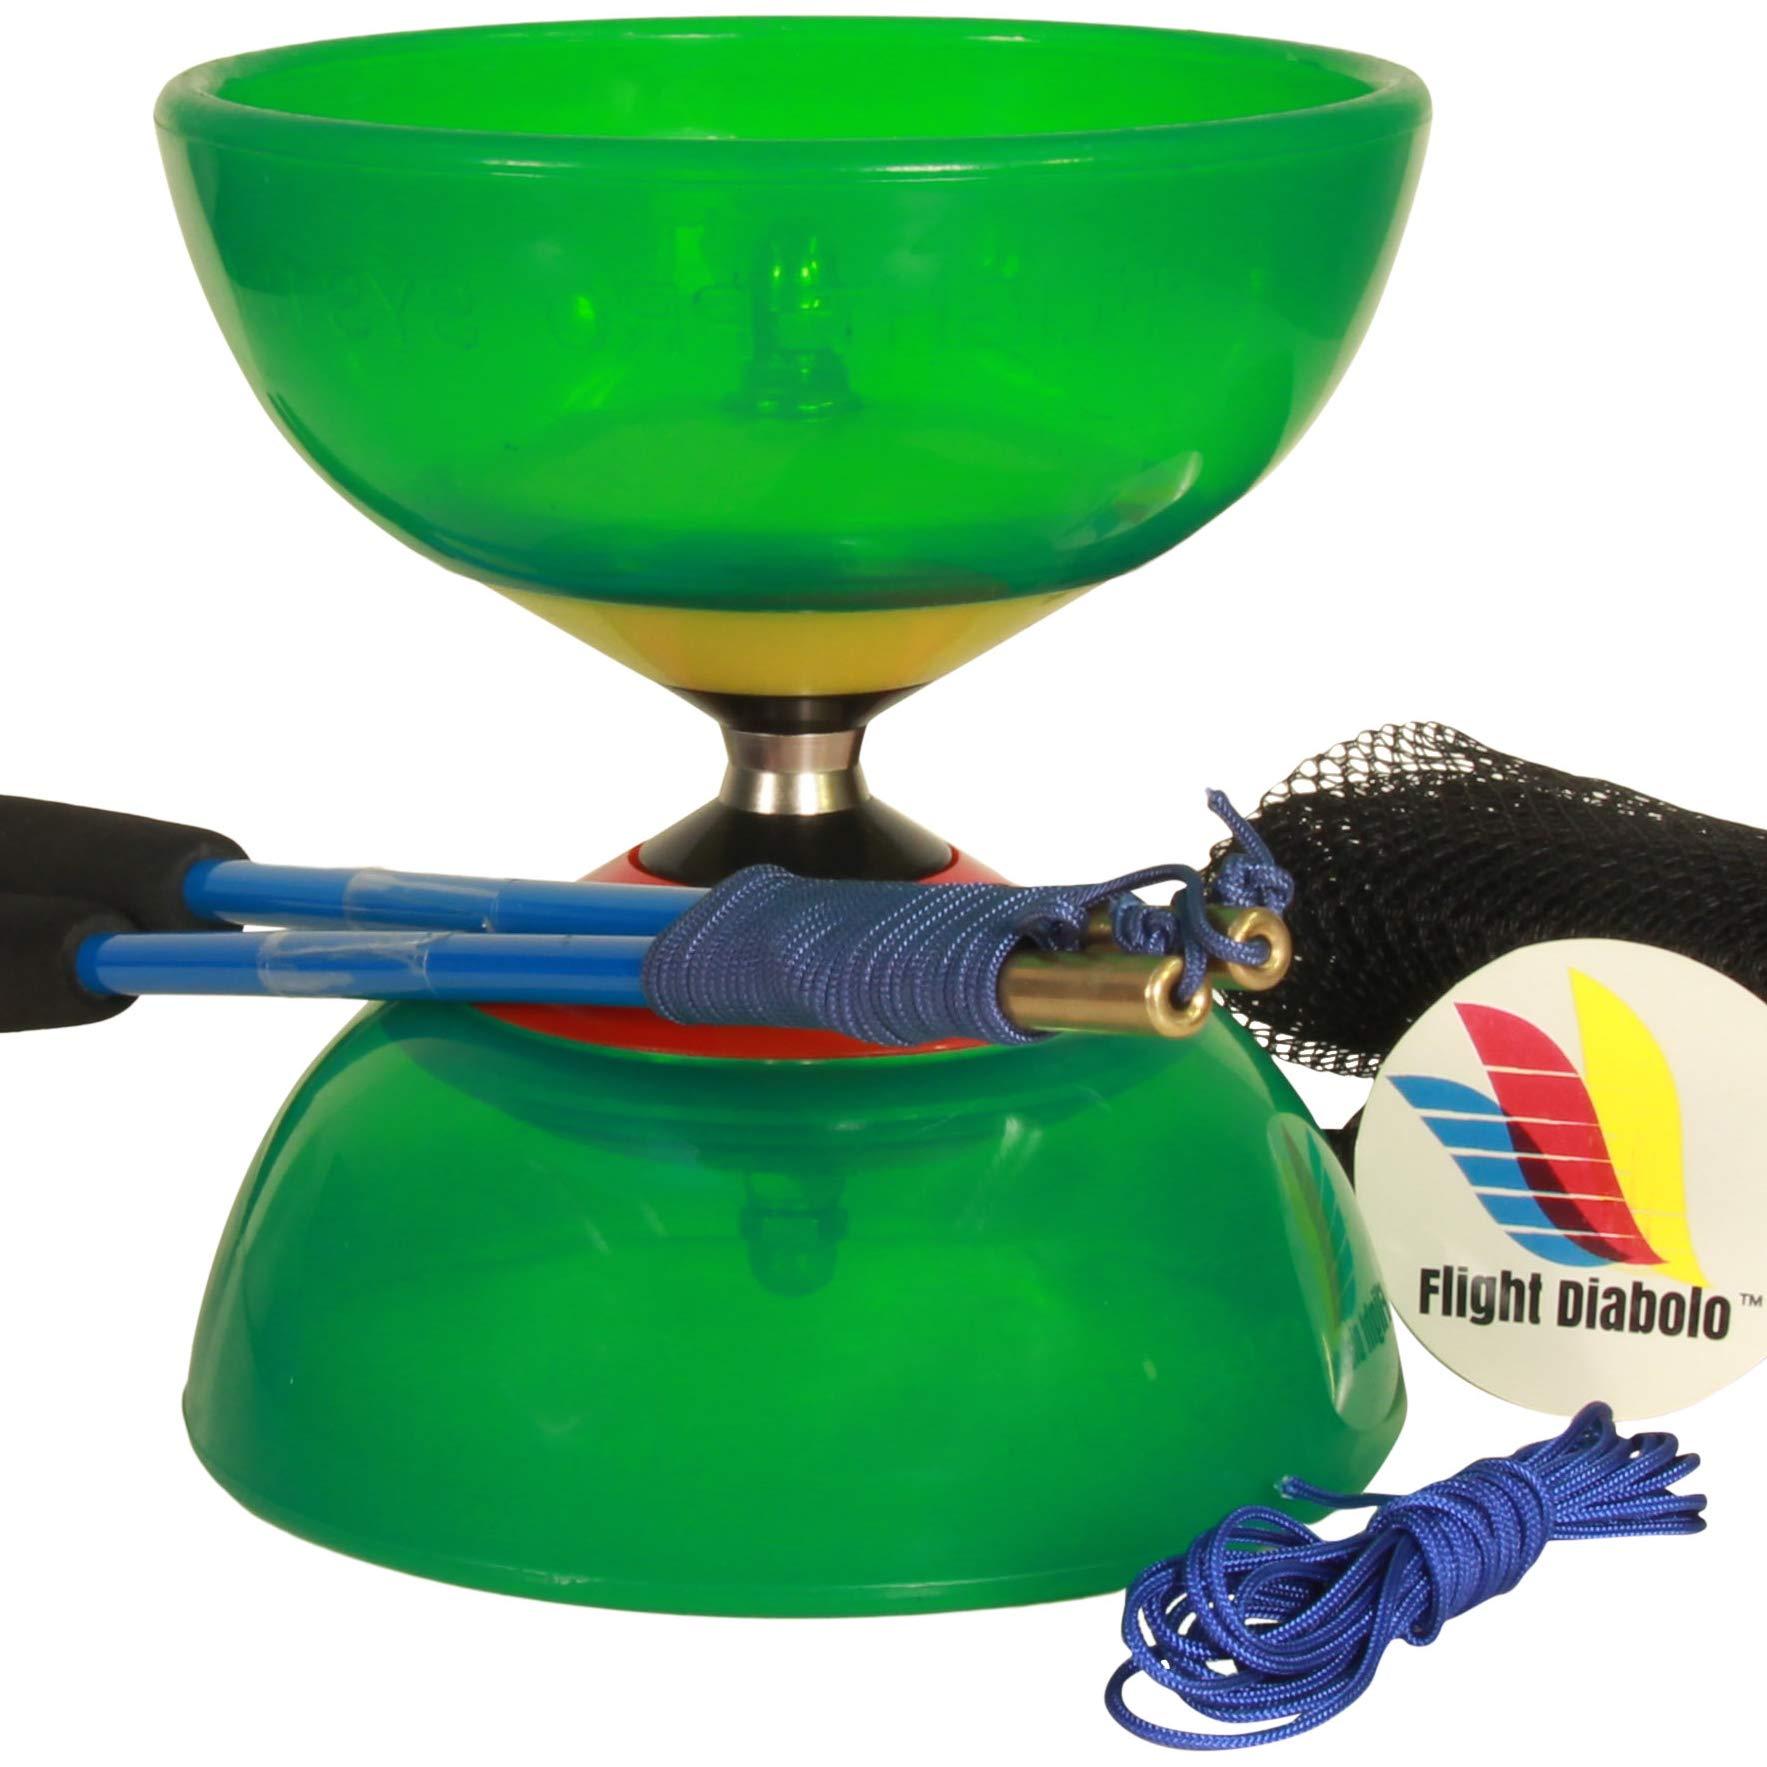 Flight Pro System 5: Triple Bearing Full Sized 5 Chinese Yoyo Diabolo Skill Toy by Flight Diabolo